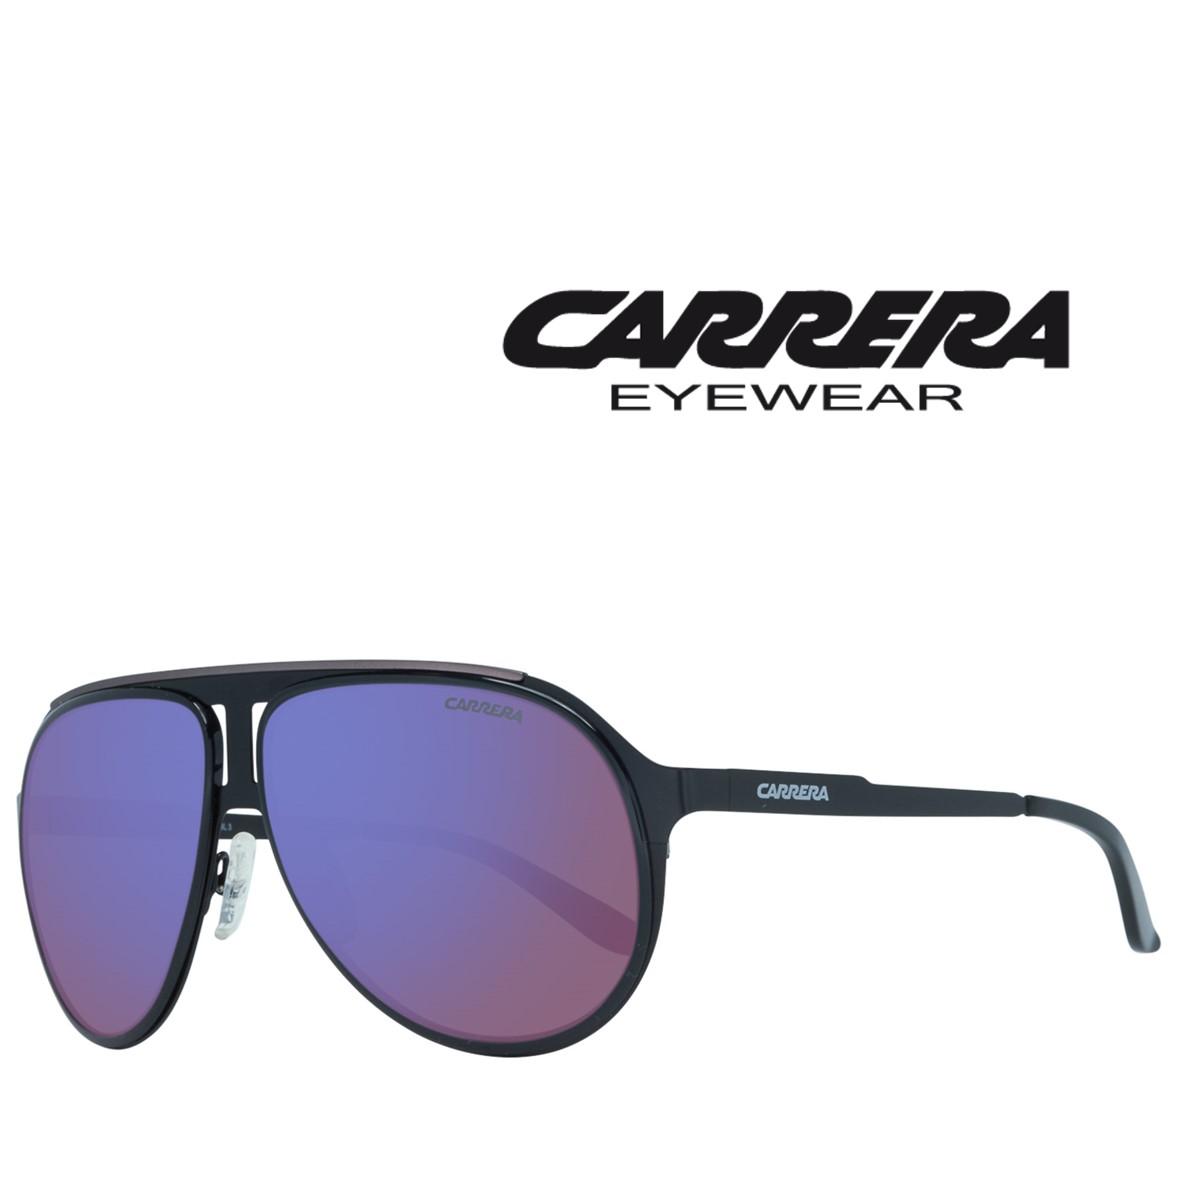 Carrera® Sunglasses CA100   S HKQ   MI 59 - You Like It a350b20c00